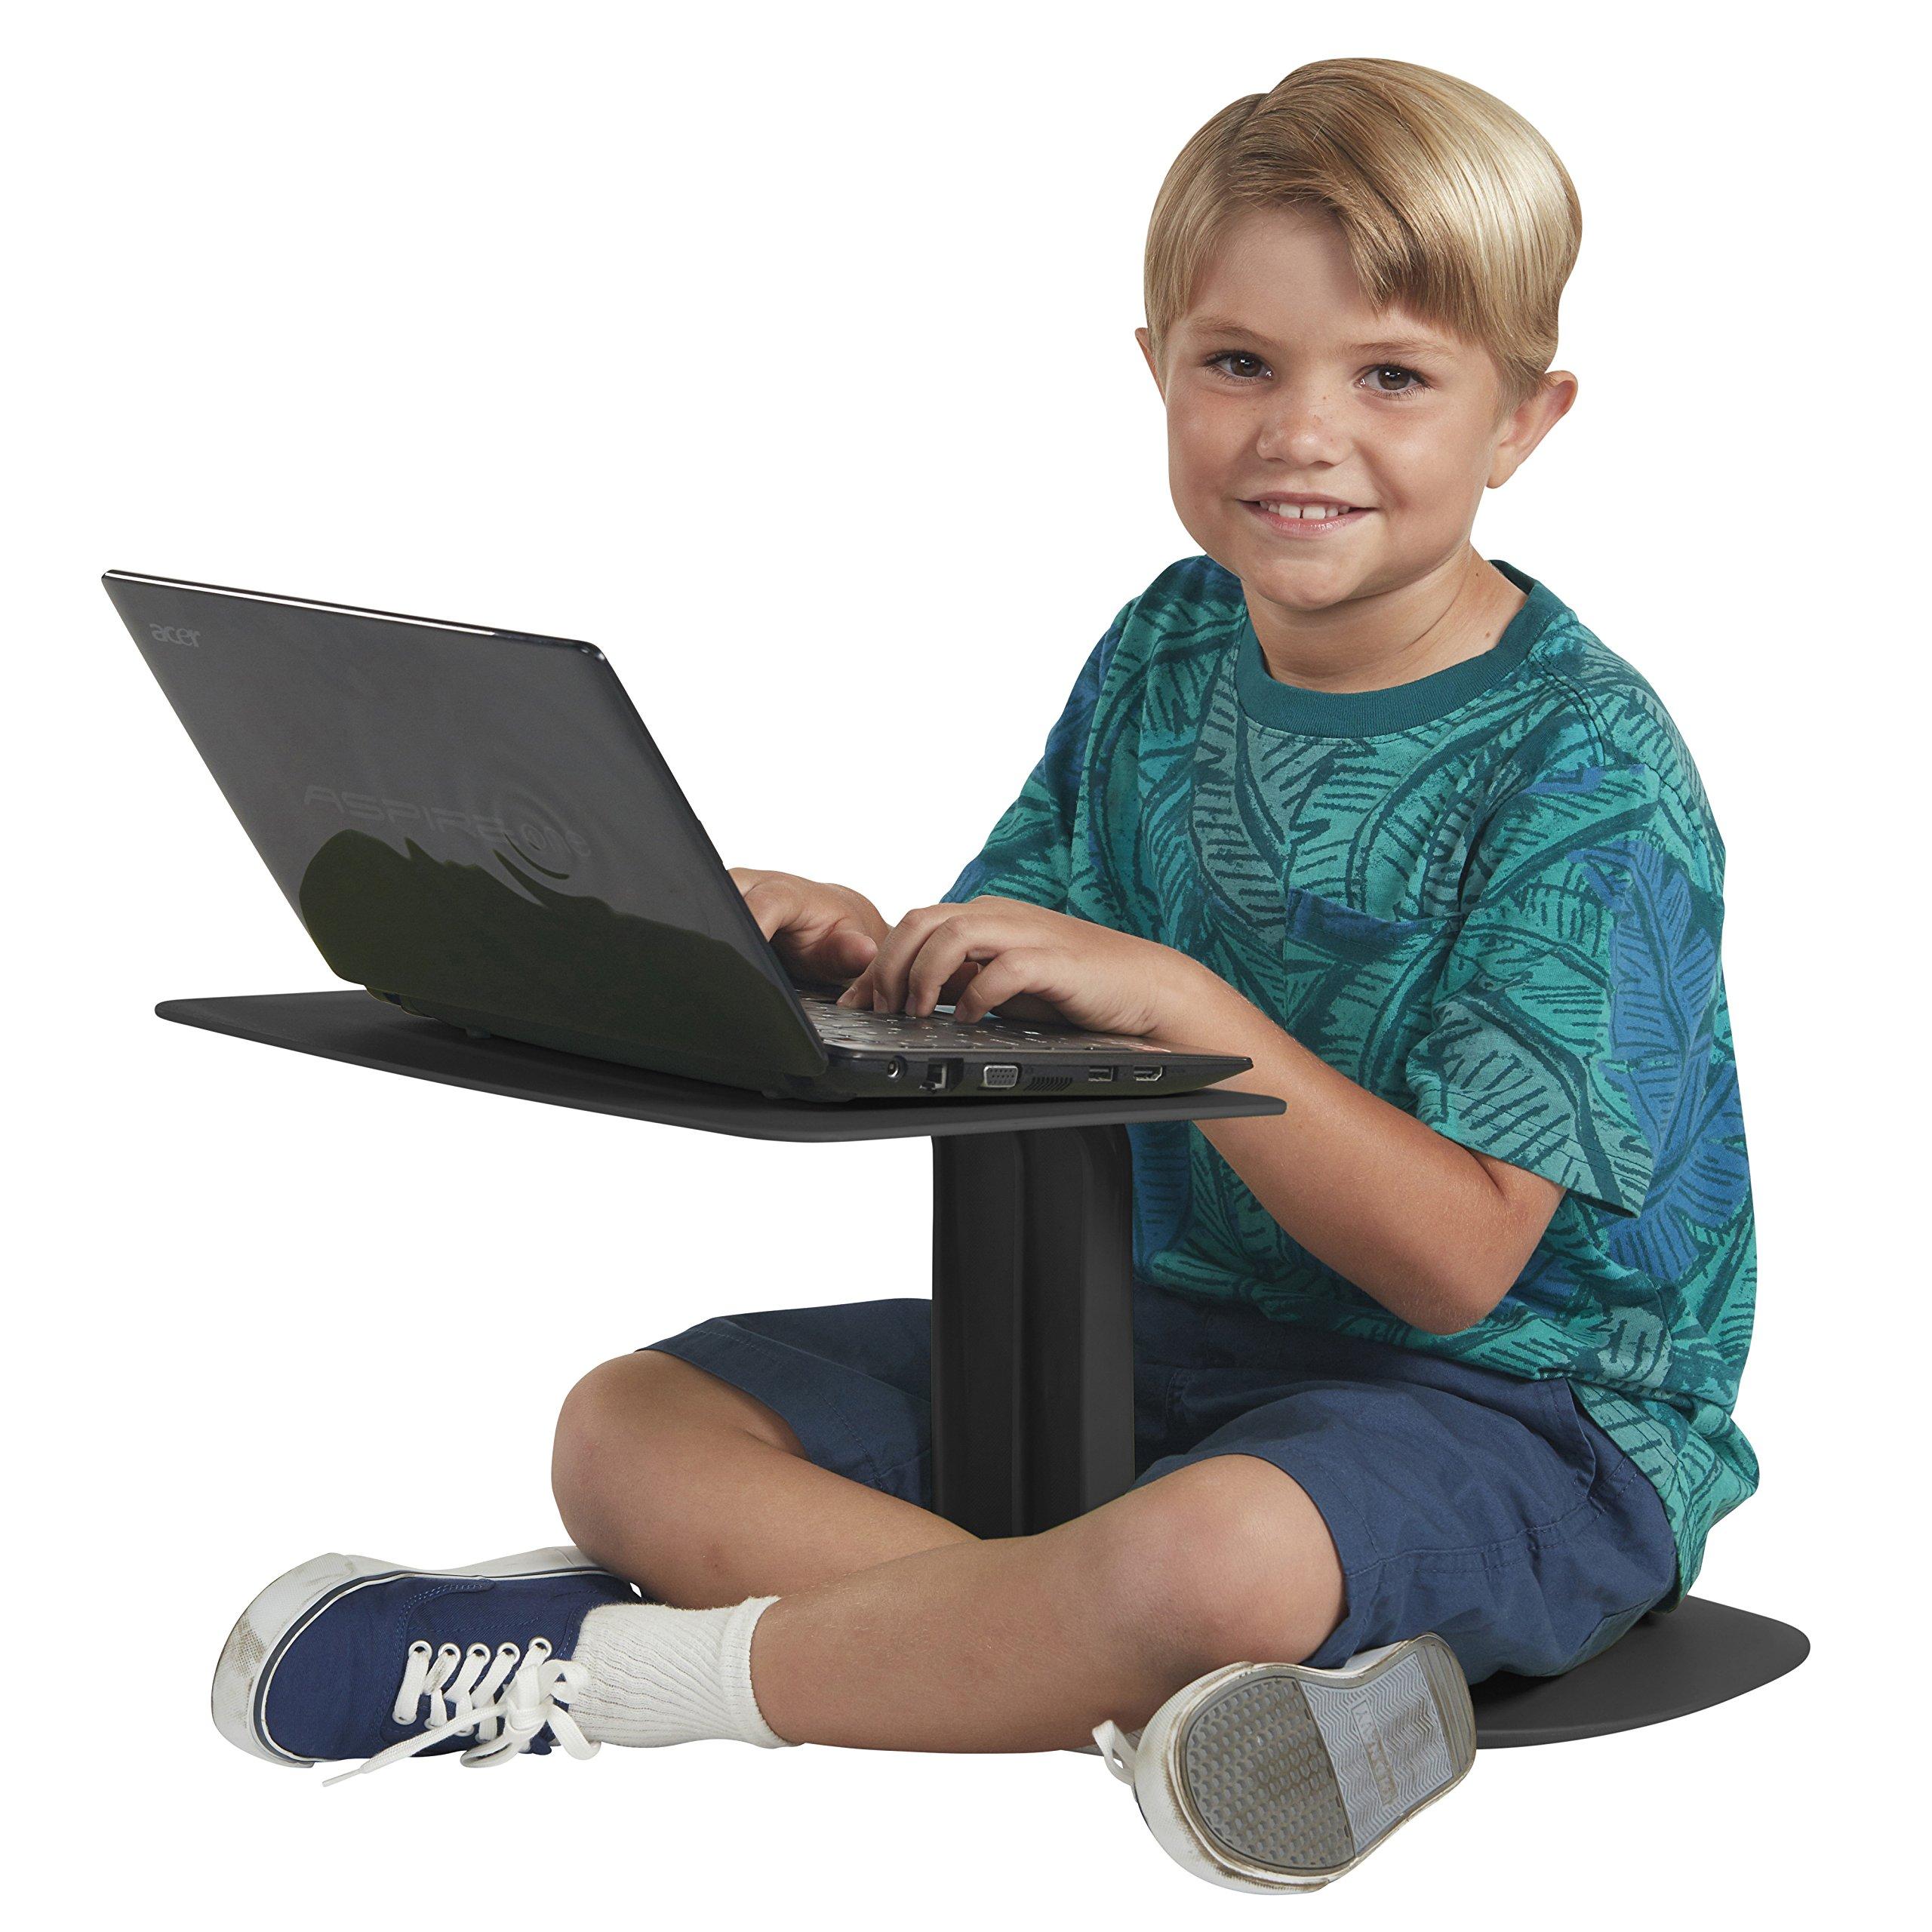 ECR4Kids The Surf Portable Lap Desk/Laptop Stand/Writing Table, Black